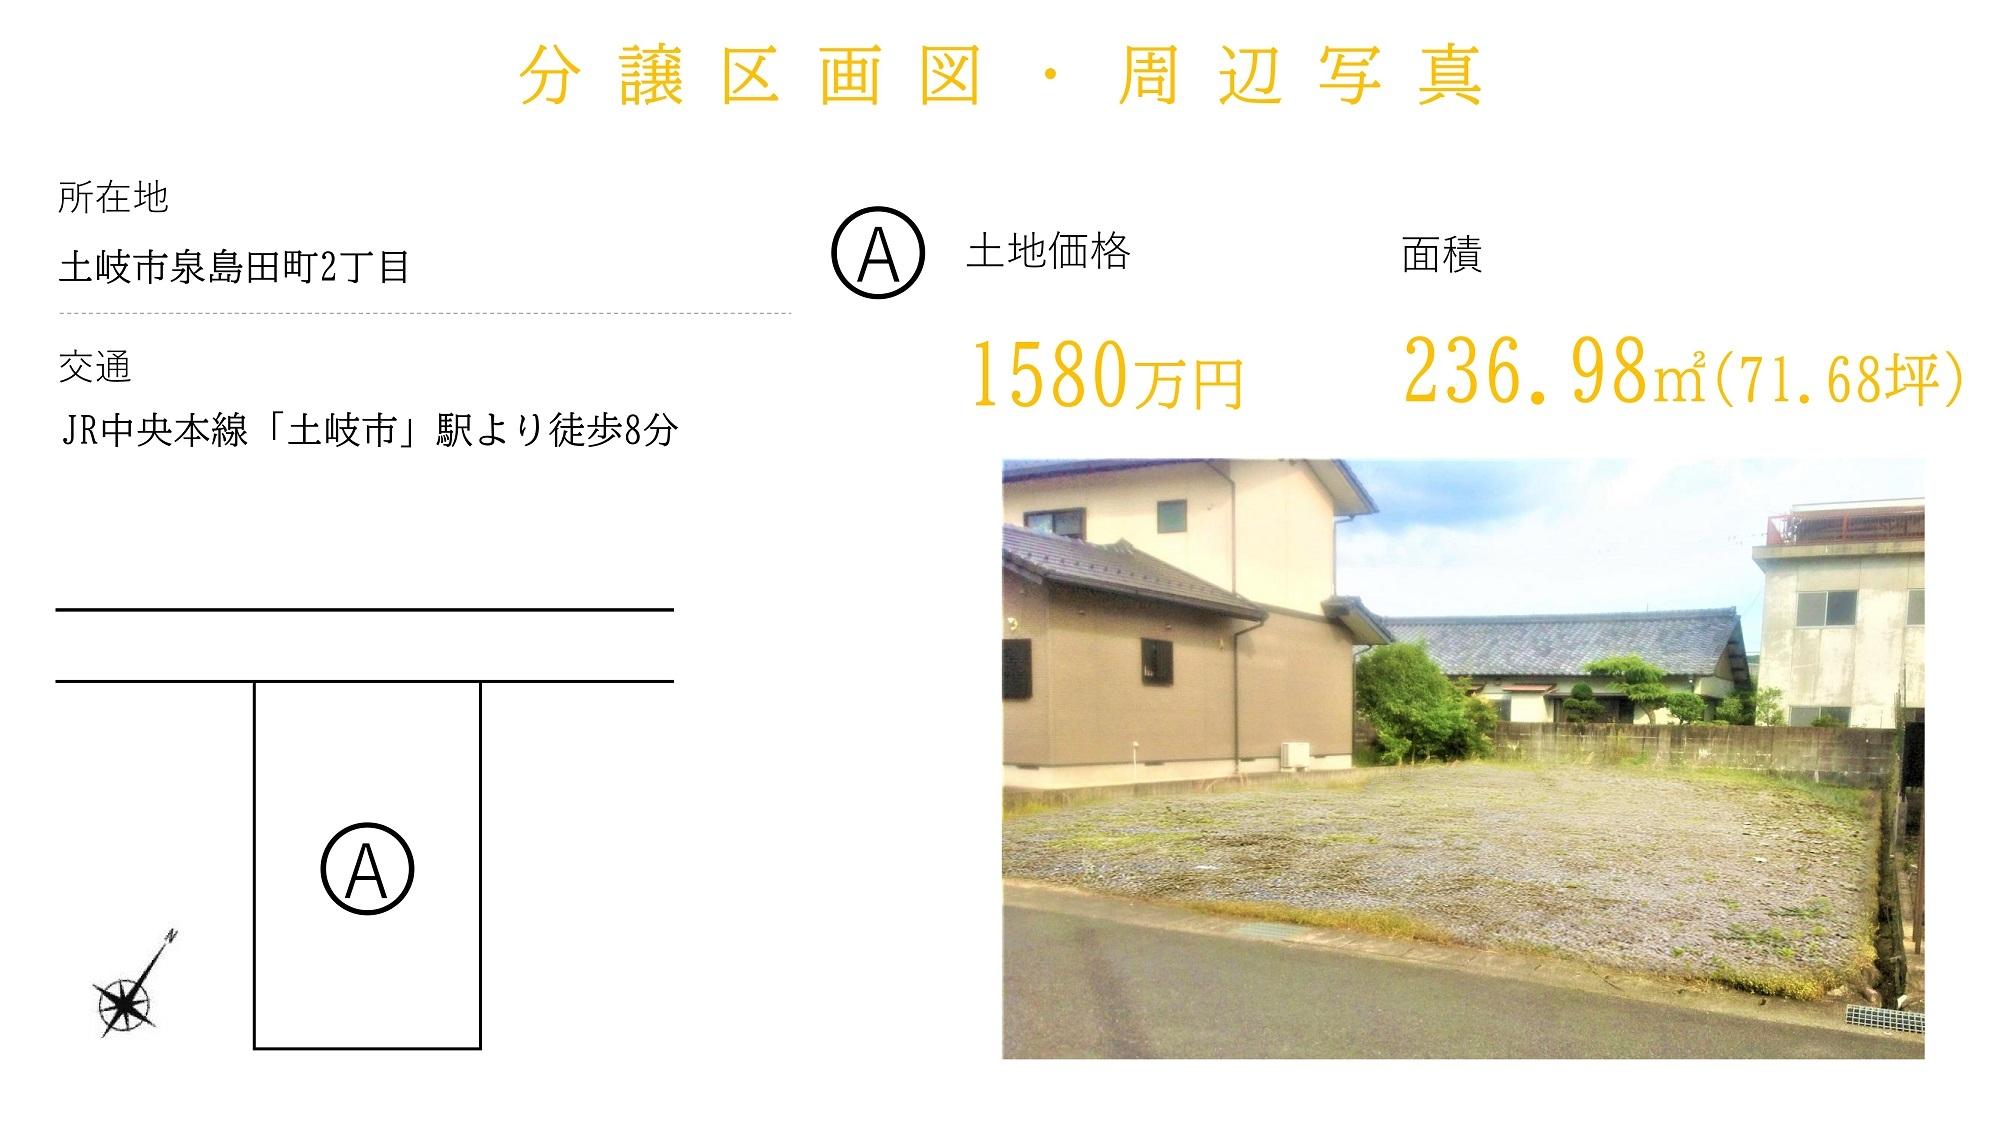 HP用土地 土岐市泉島田町2丁目_PAGE0004.jpg